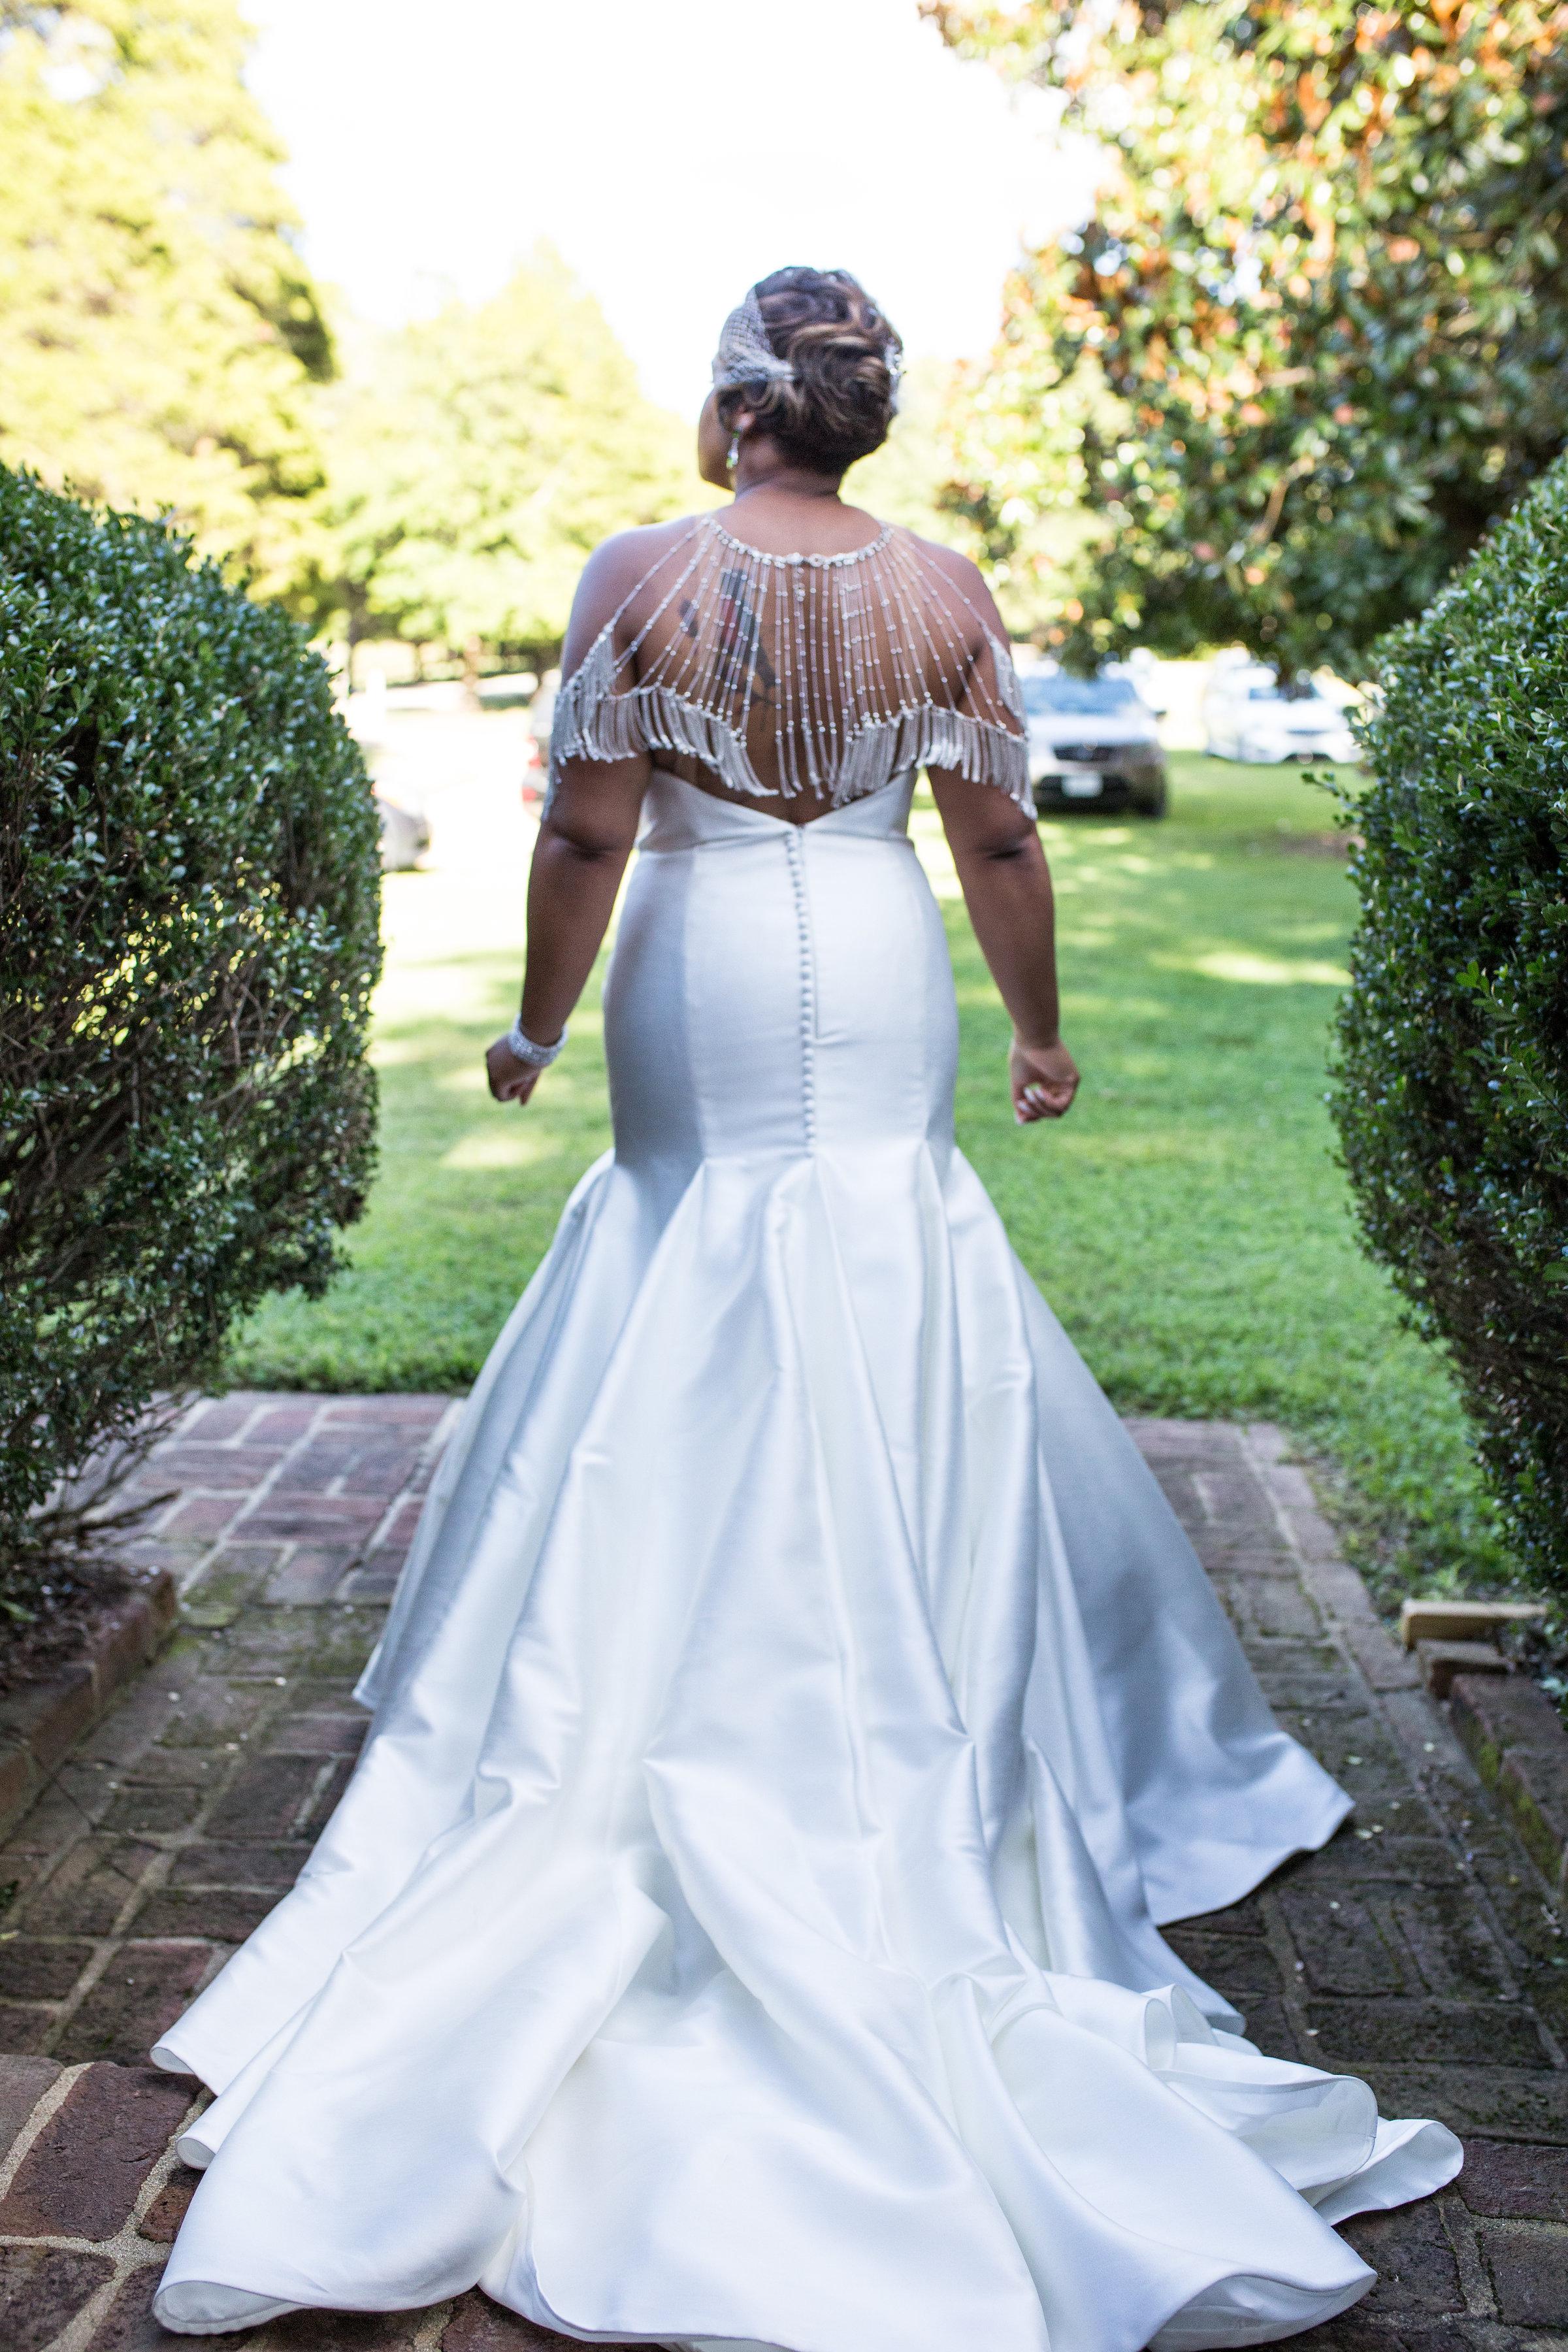 brandon_shannon_wedding-1172.jpg